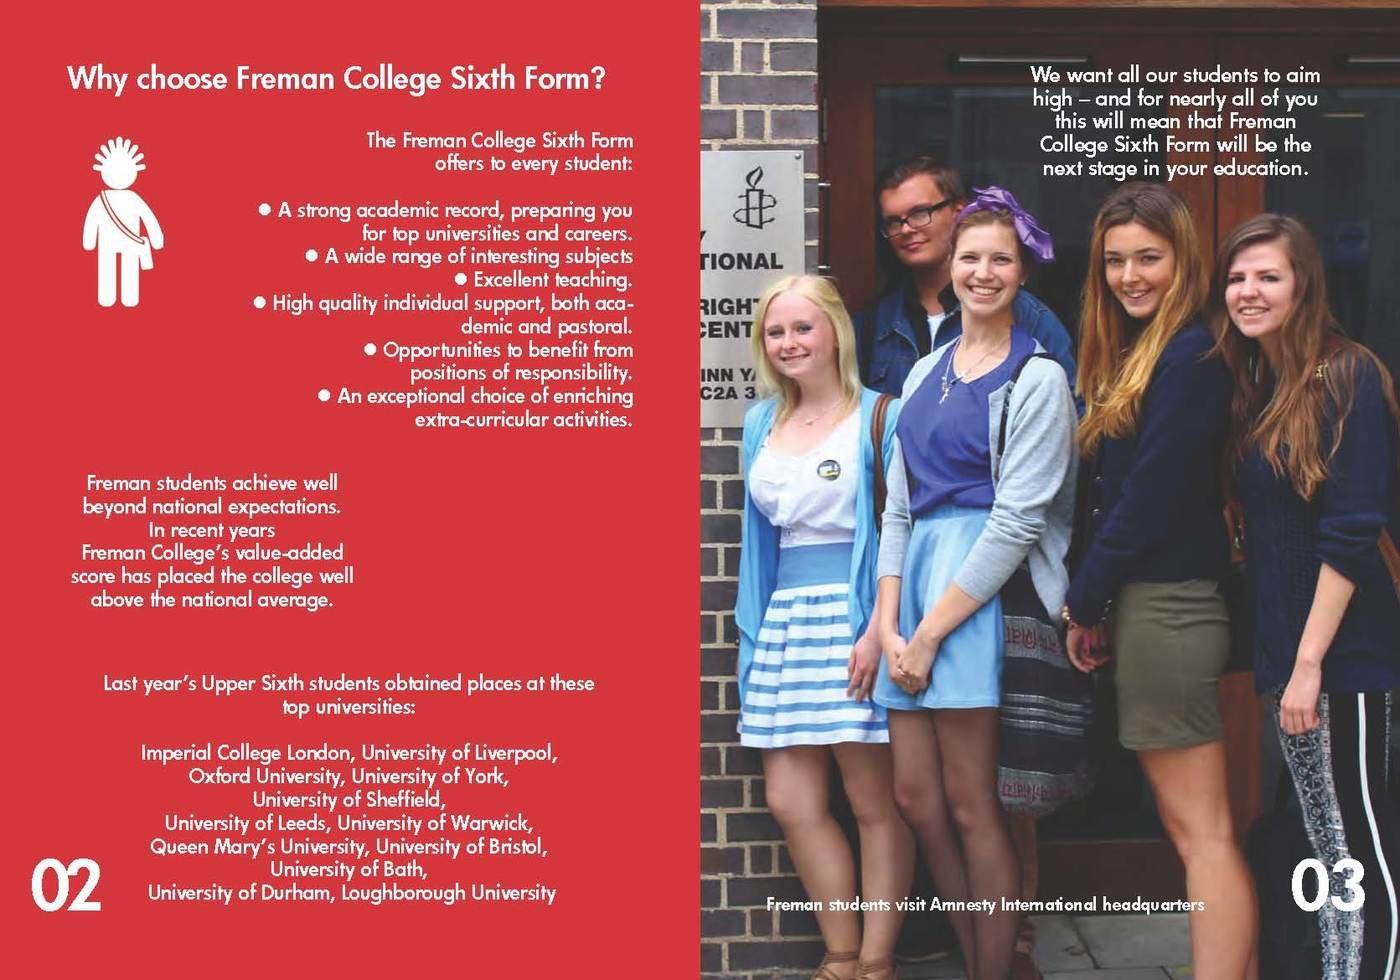 freman college sixth form prospectus by chris allan at coroflot com